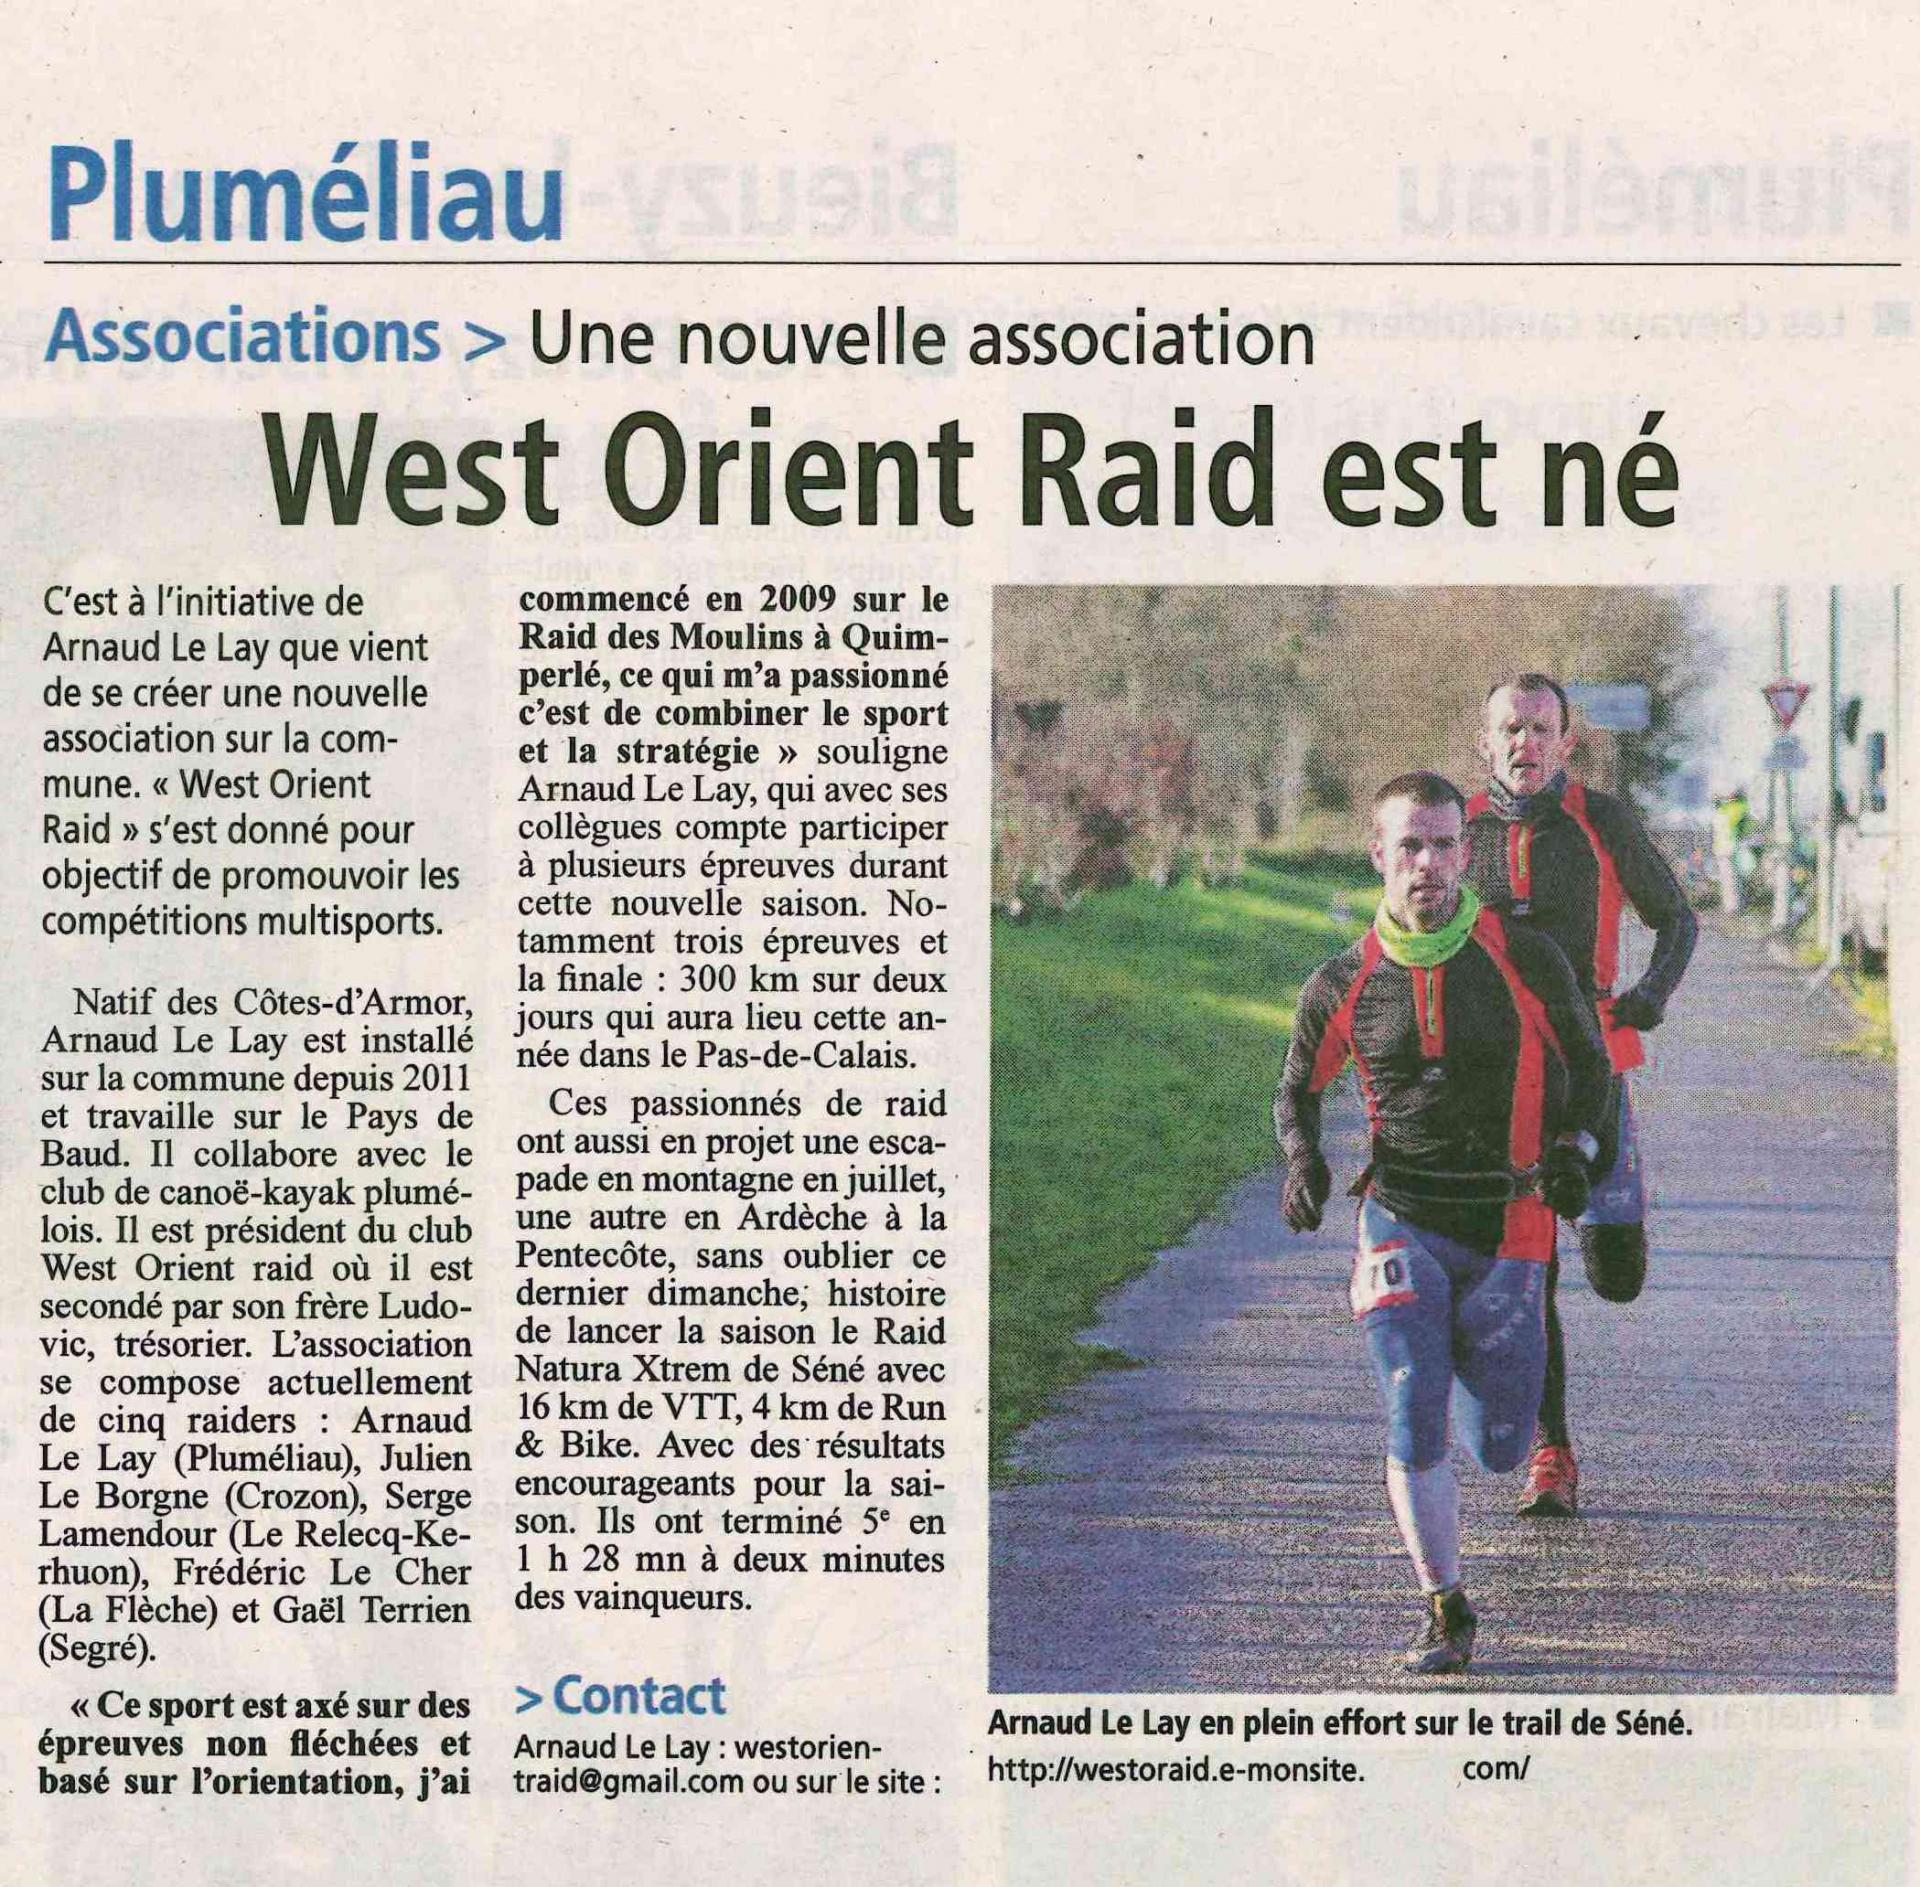 La gazette du morbihan 6 fev 2015